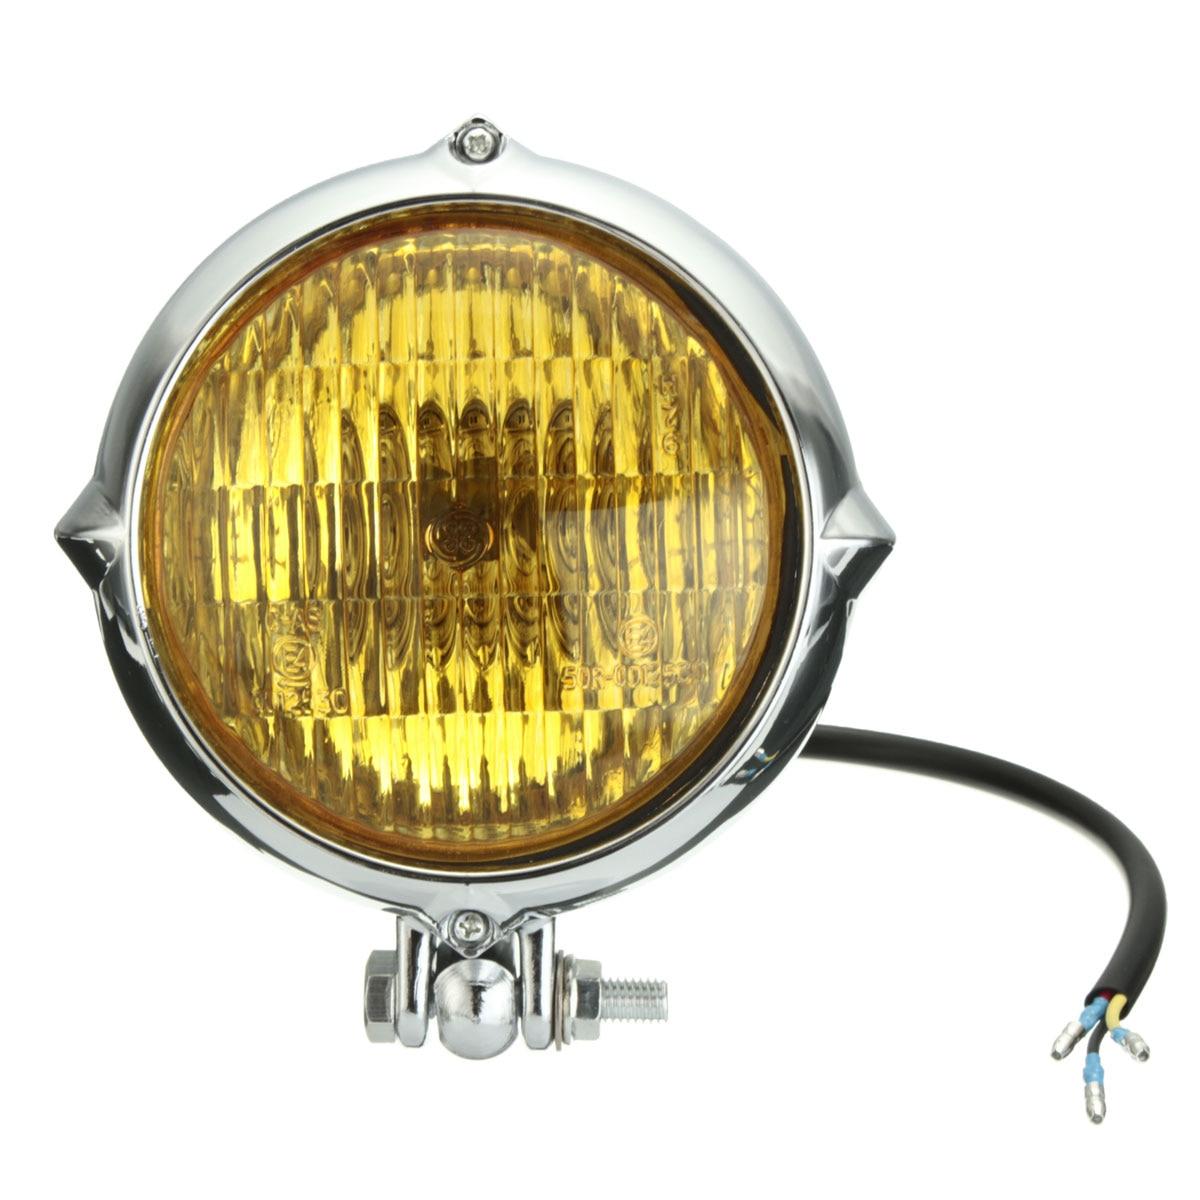 Nuevo Chrome negro 4 pulgadas faros amarillo luz lámpara para Harley Bobber helicóptero